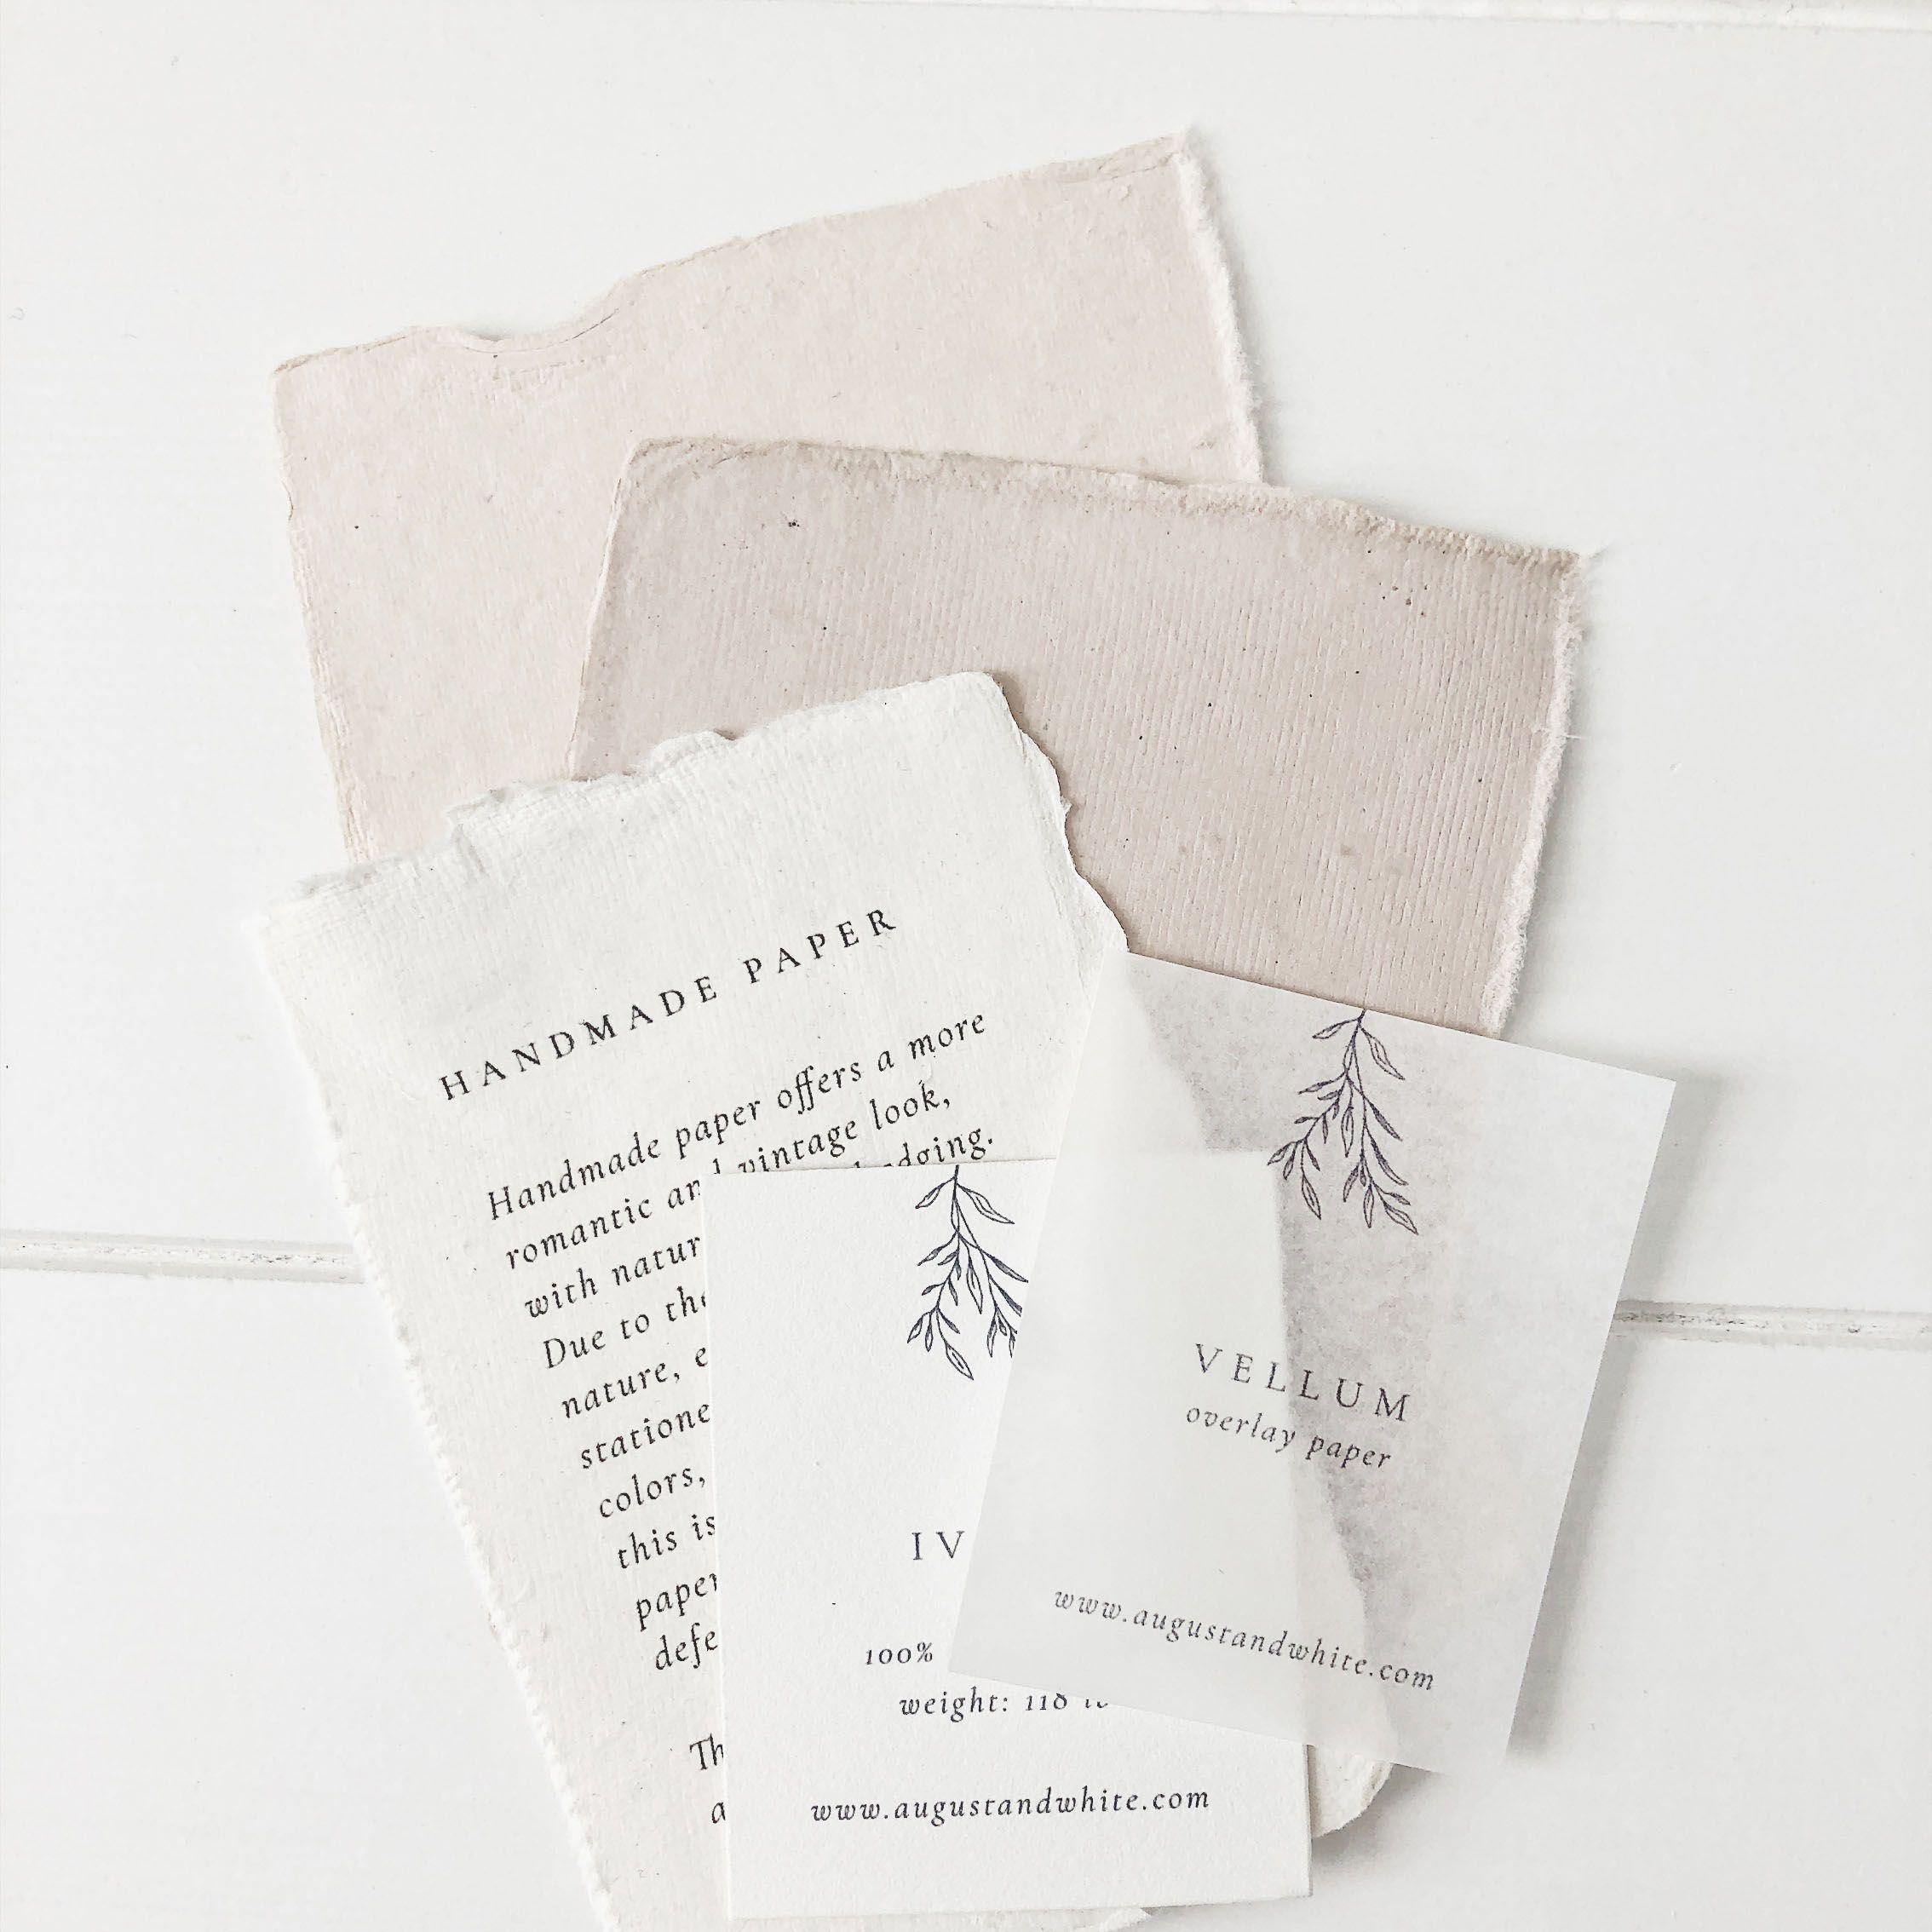 Fine Art Wedding Invitations Handmade Paper Wedding Invitations Letterpress Wedding I Wedding Paper Wedding Invitations Diy Letterpress Wedding Invitations